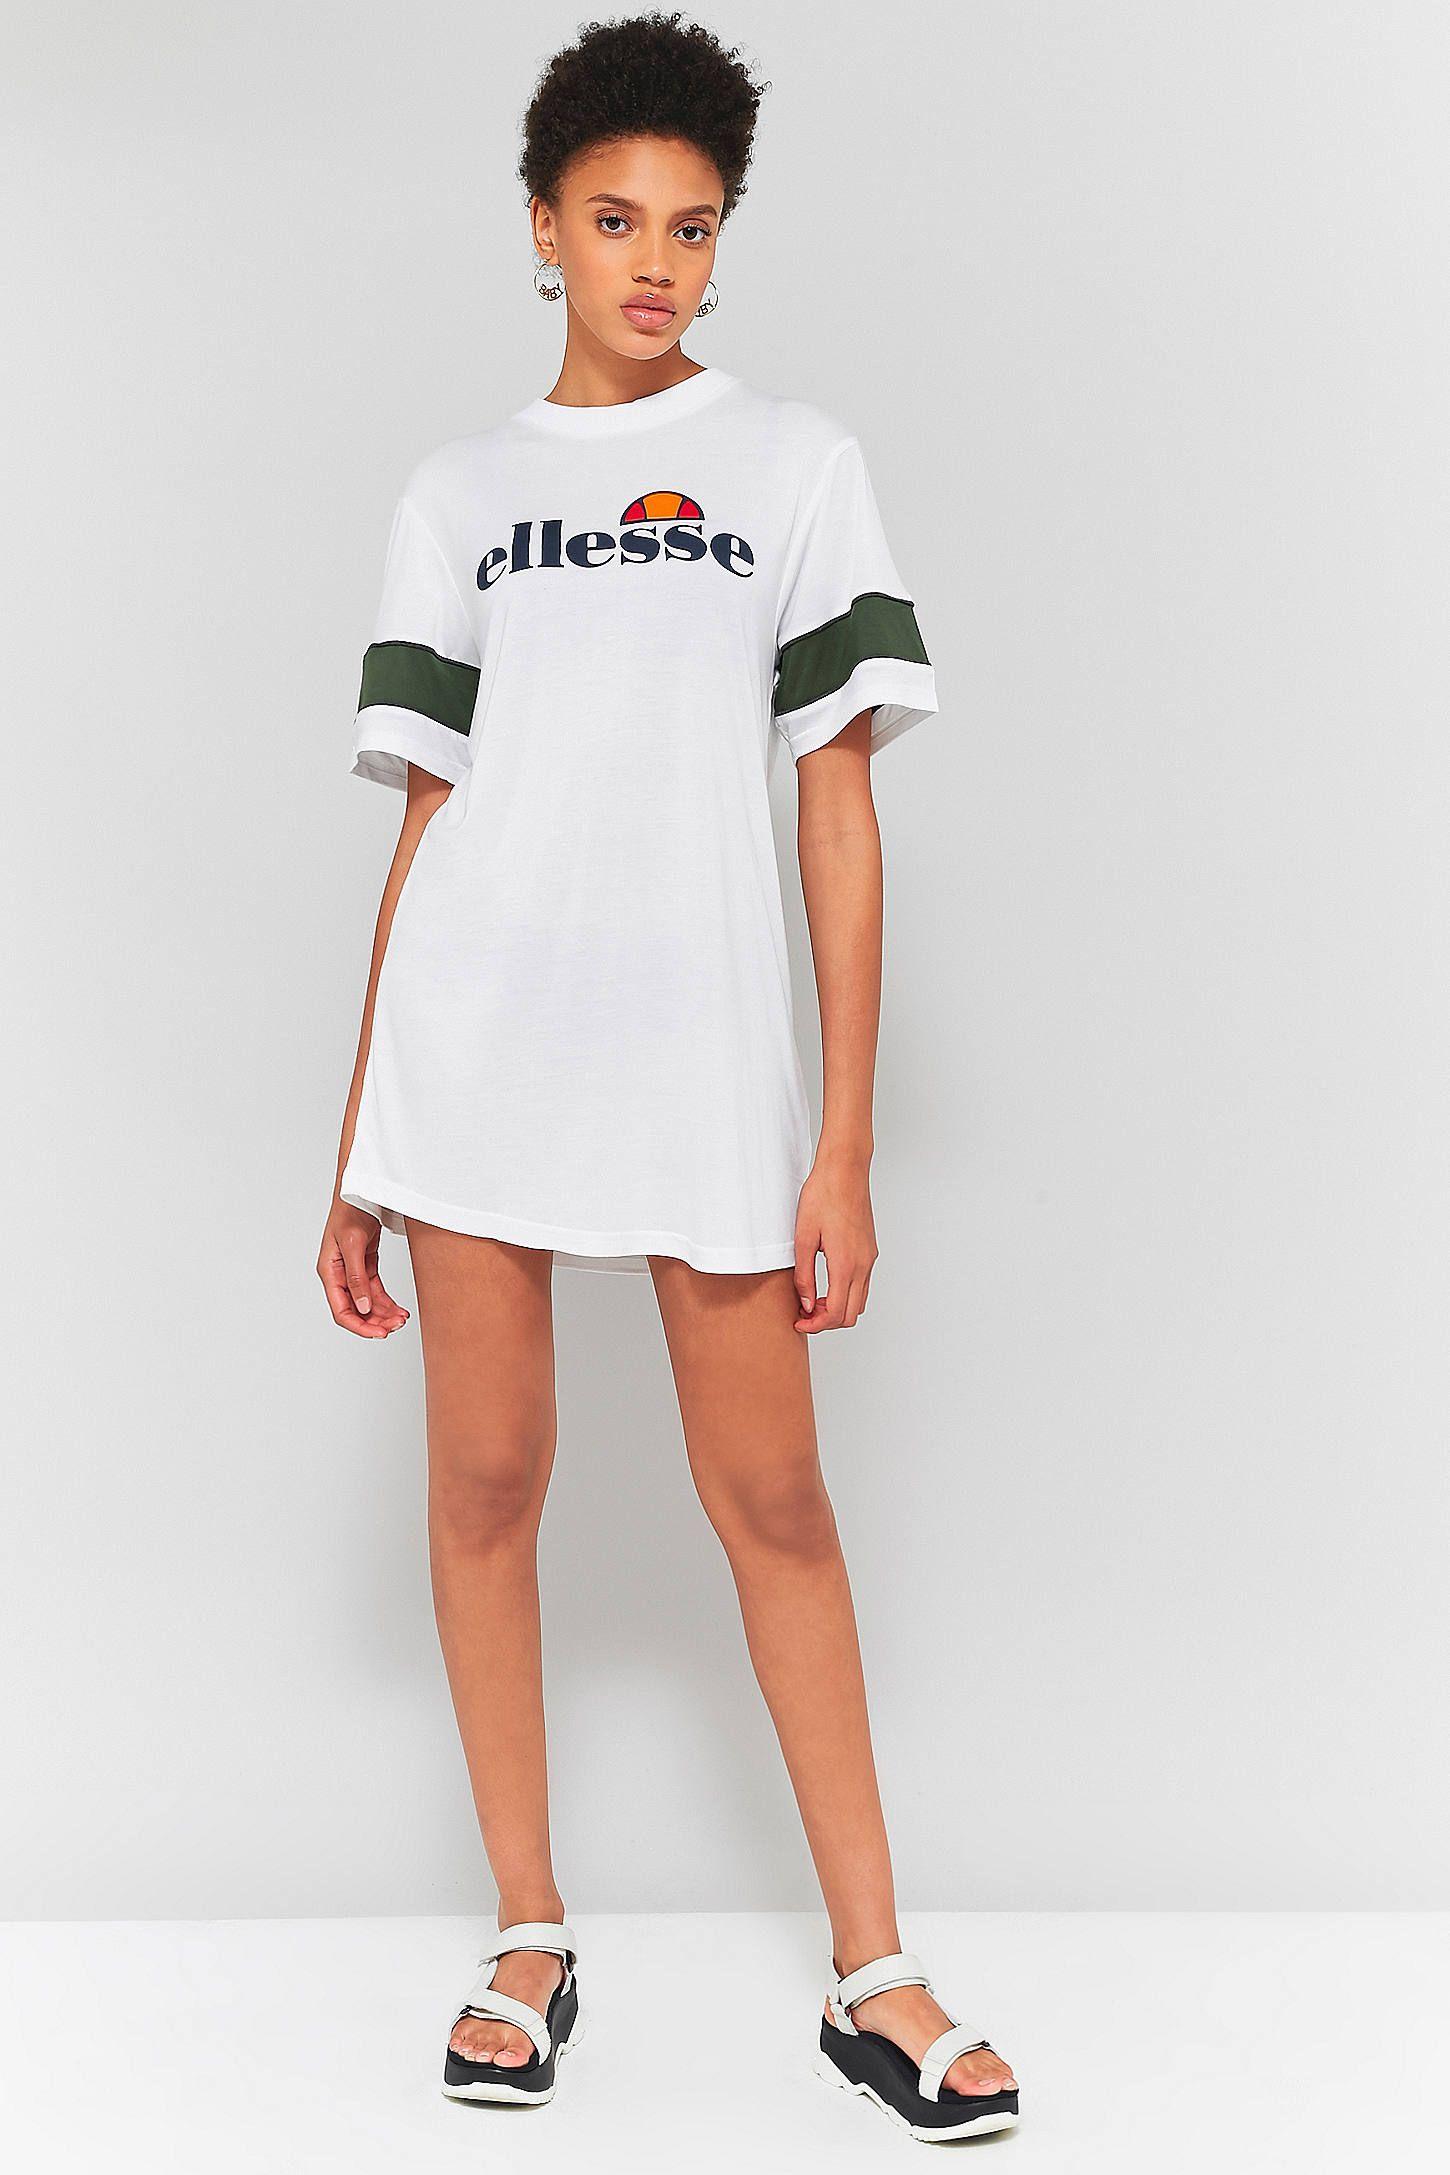 Ellesse Tifa T Shirt Dress T Shirt Dress Jumpsuit Dress Shirt Dress